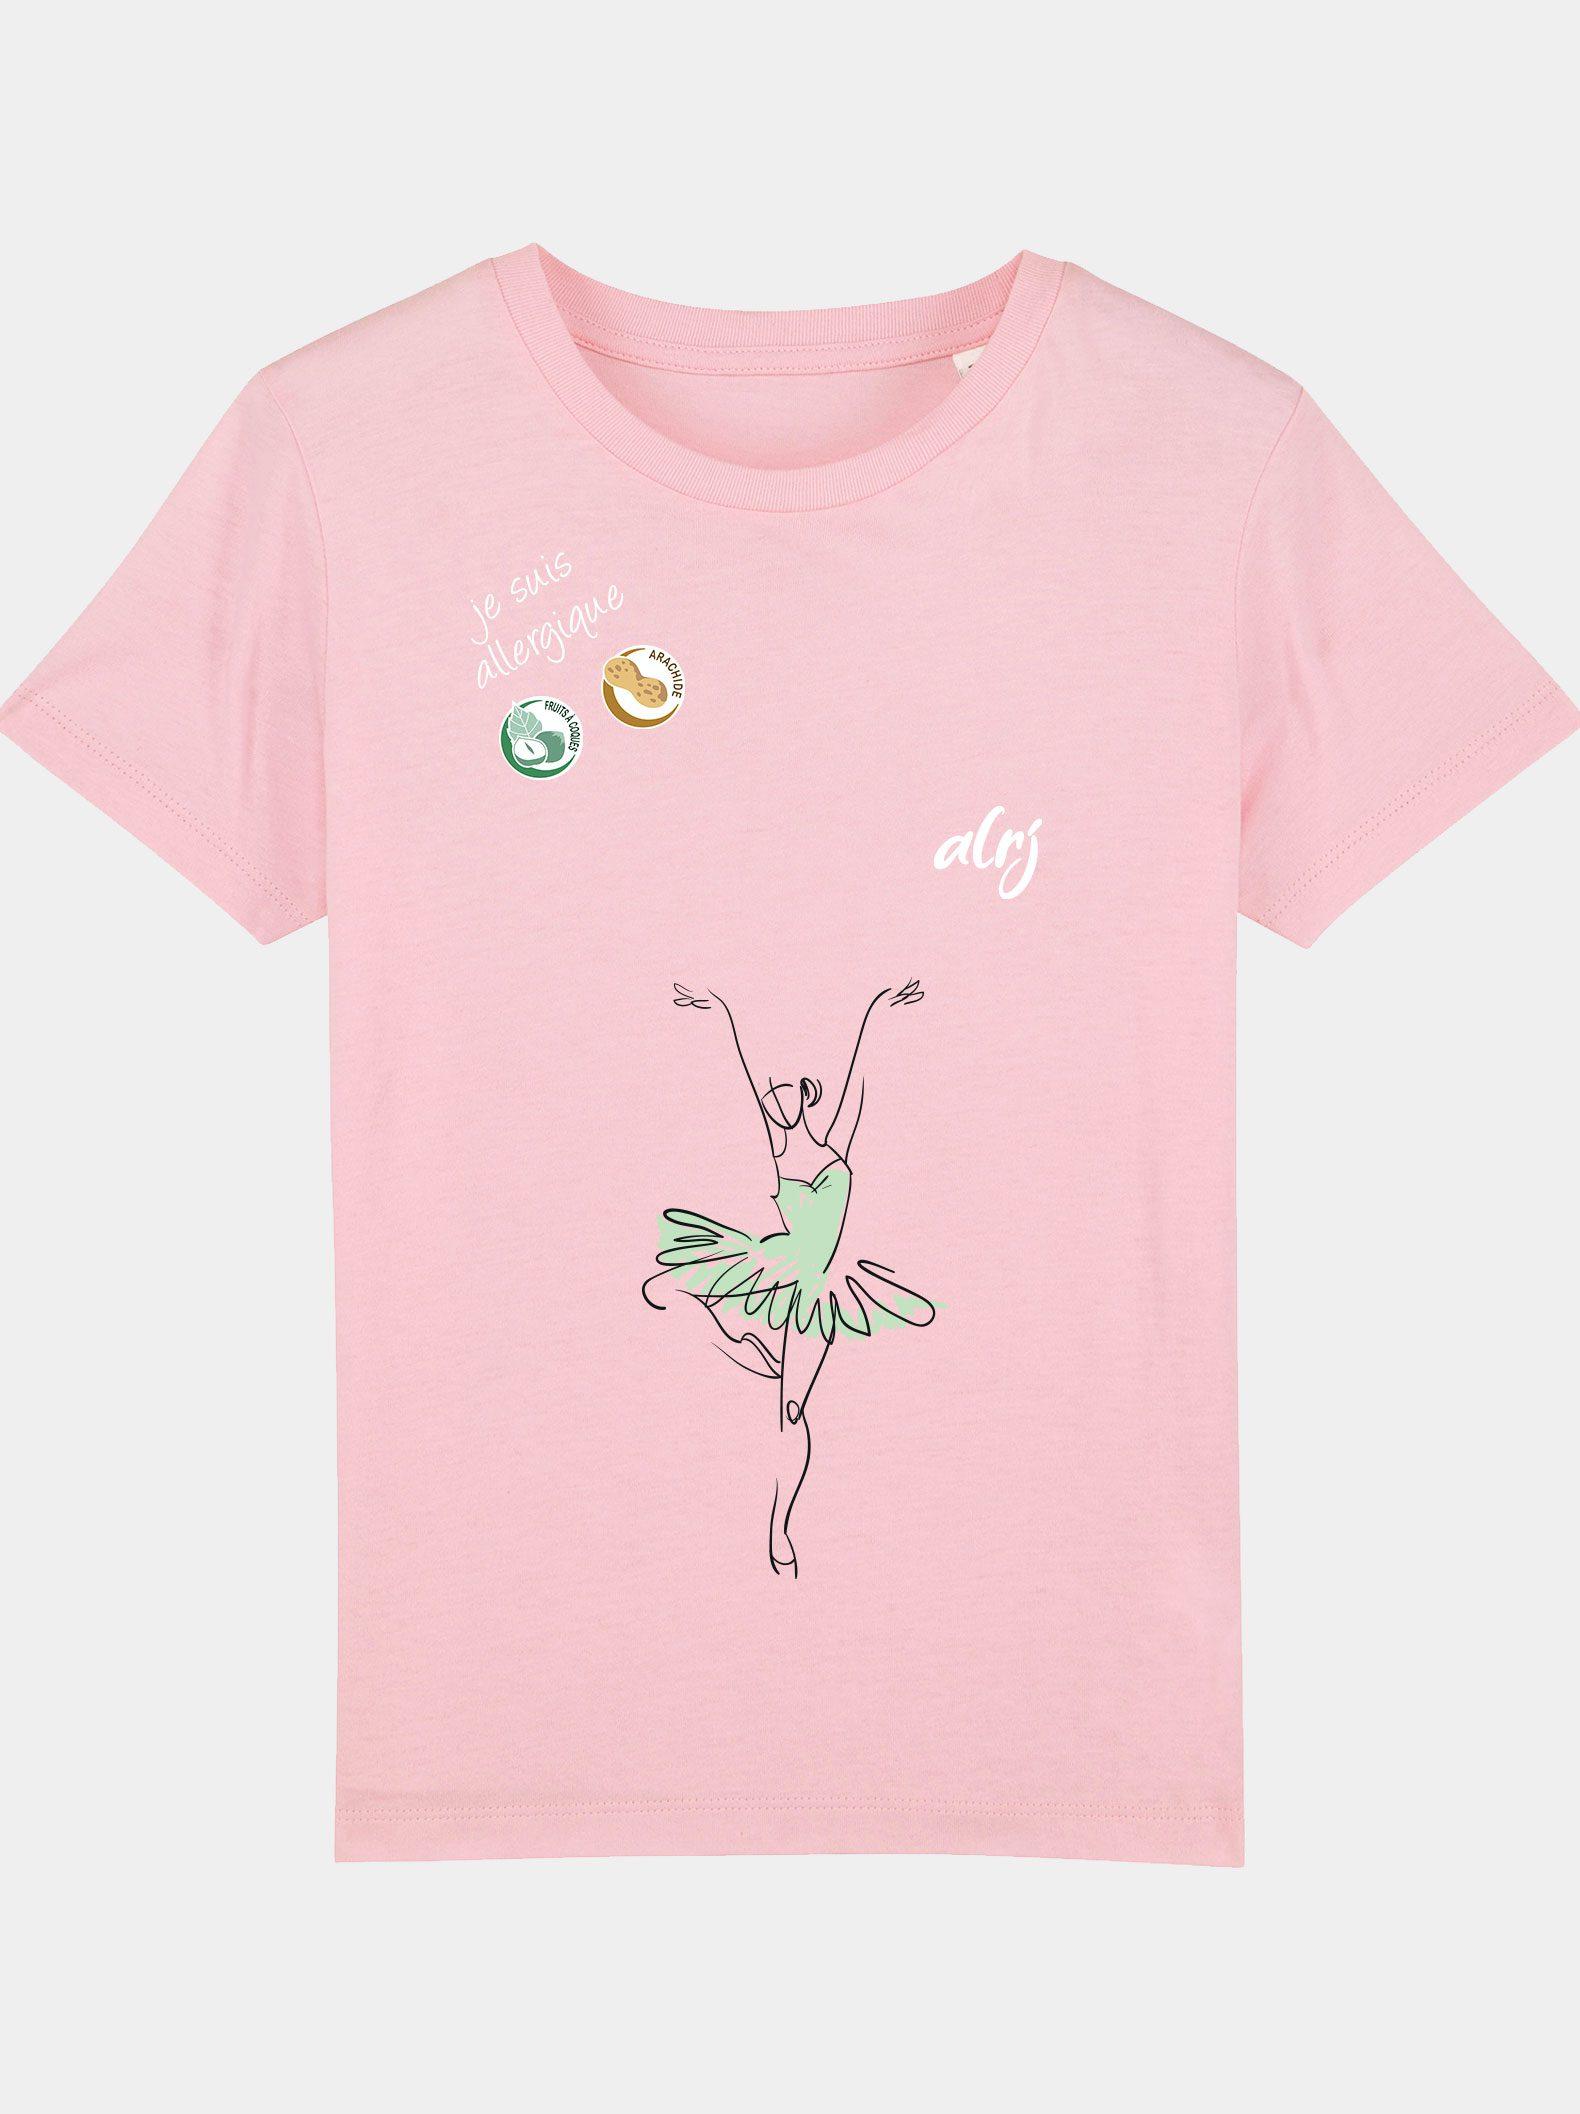 t-shirt alrj allergies alimentaires ballet rose bonbon